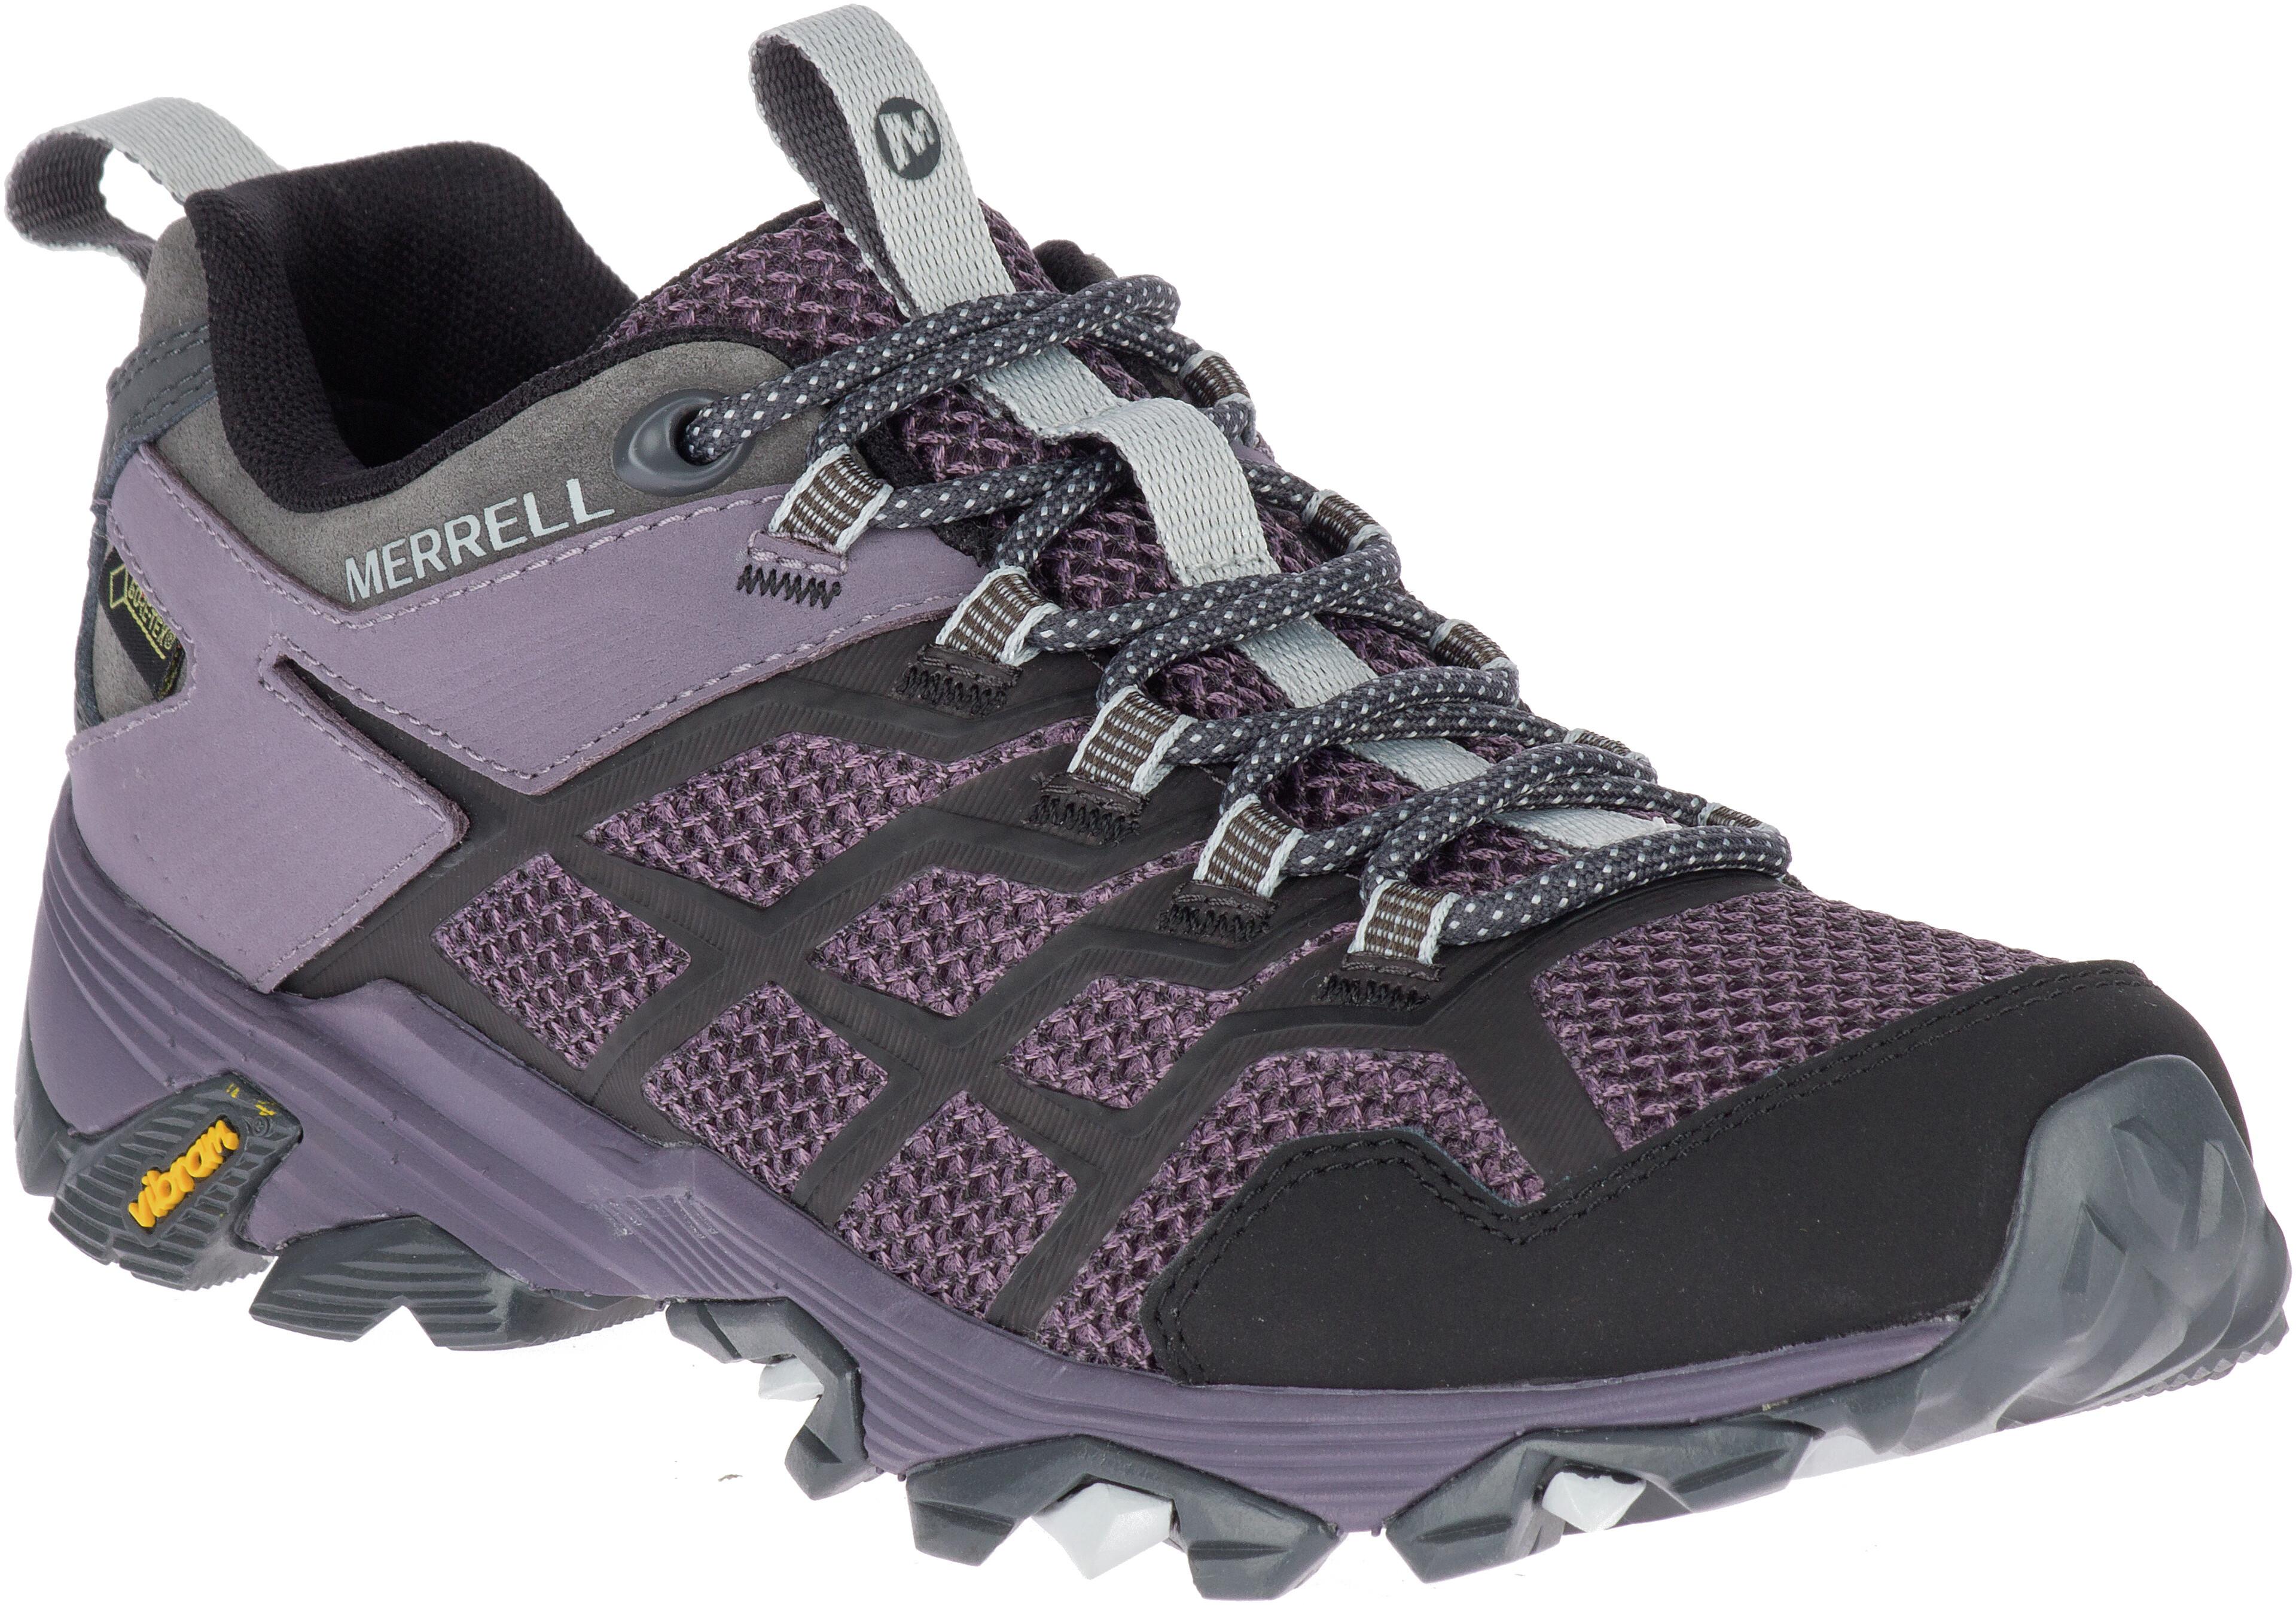 3354681c0579a Merrell Moab FST 2 GTX - Calzado Mujer - gris violeta